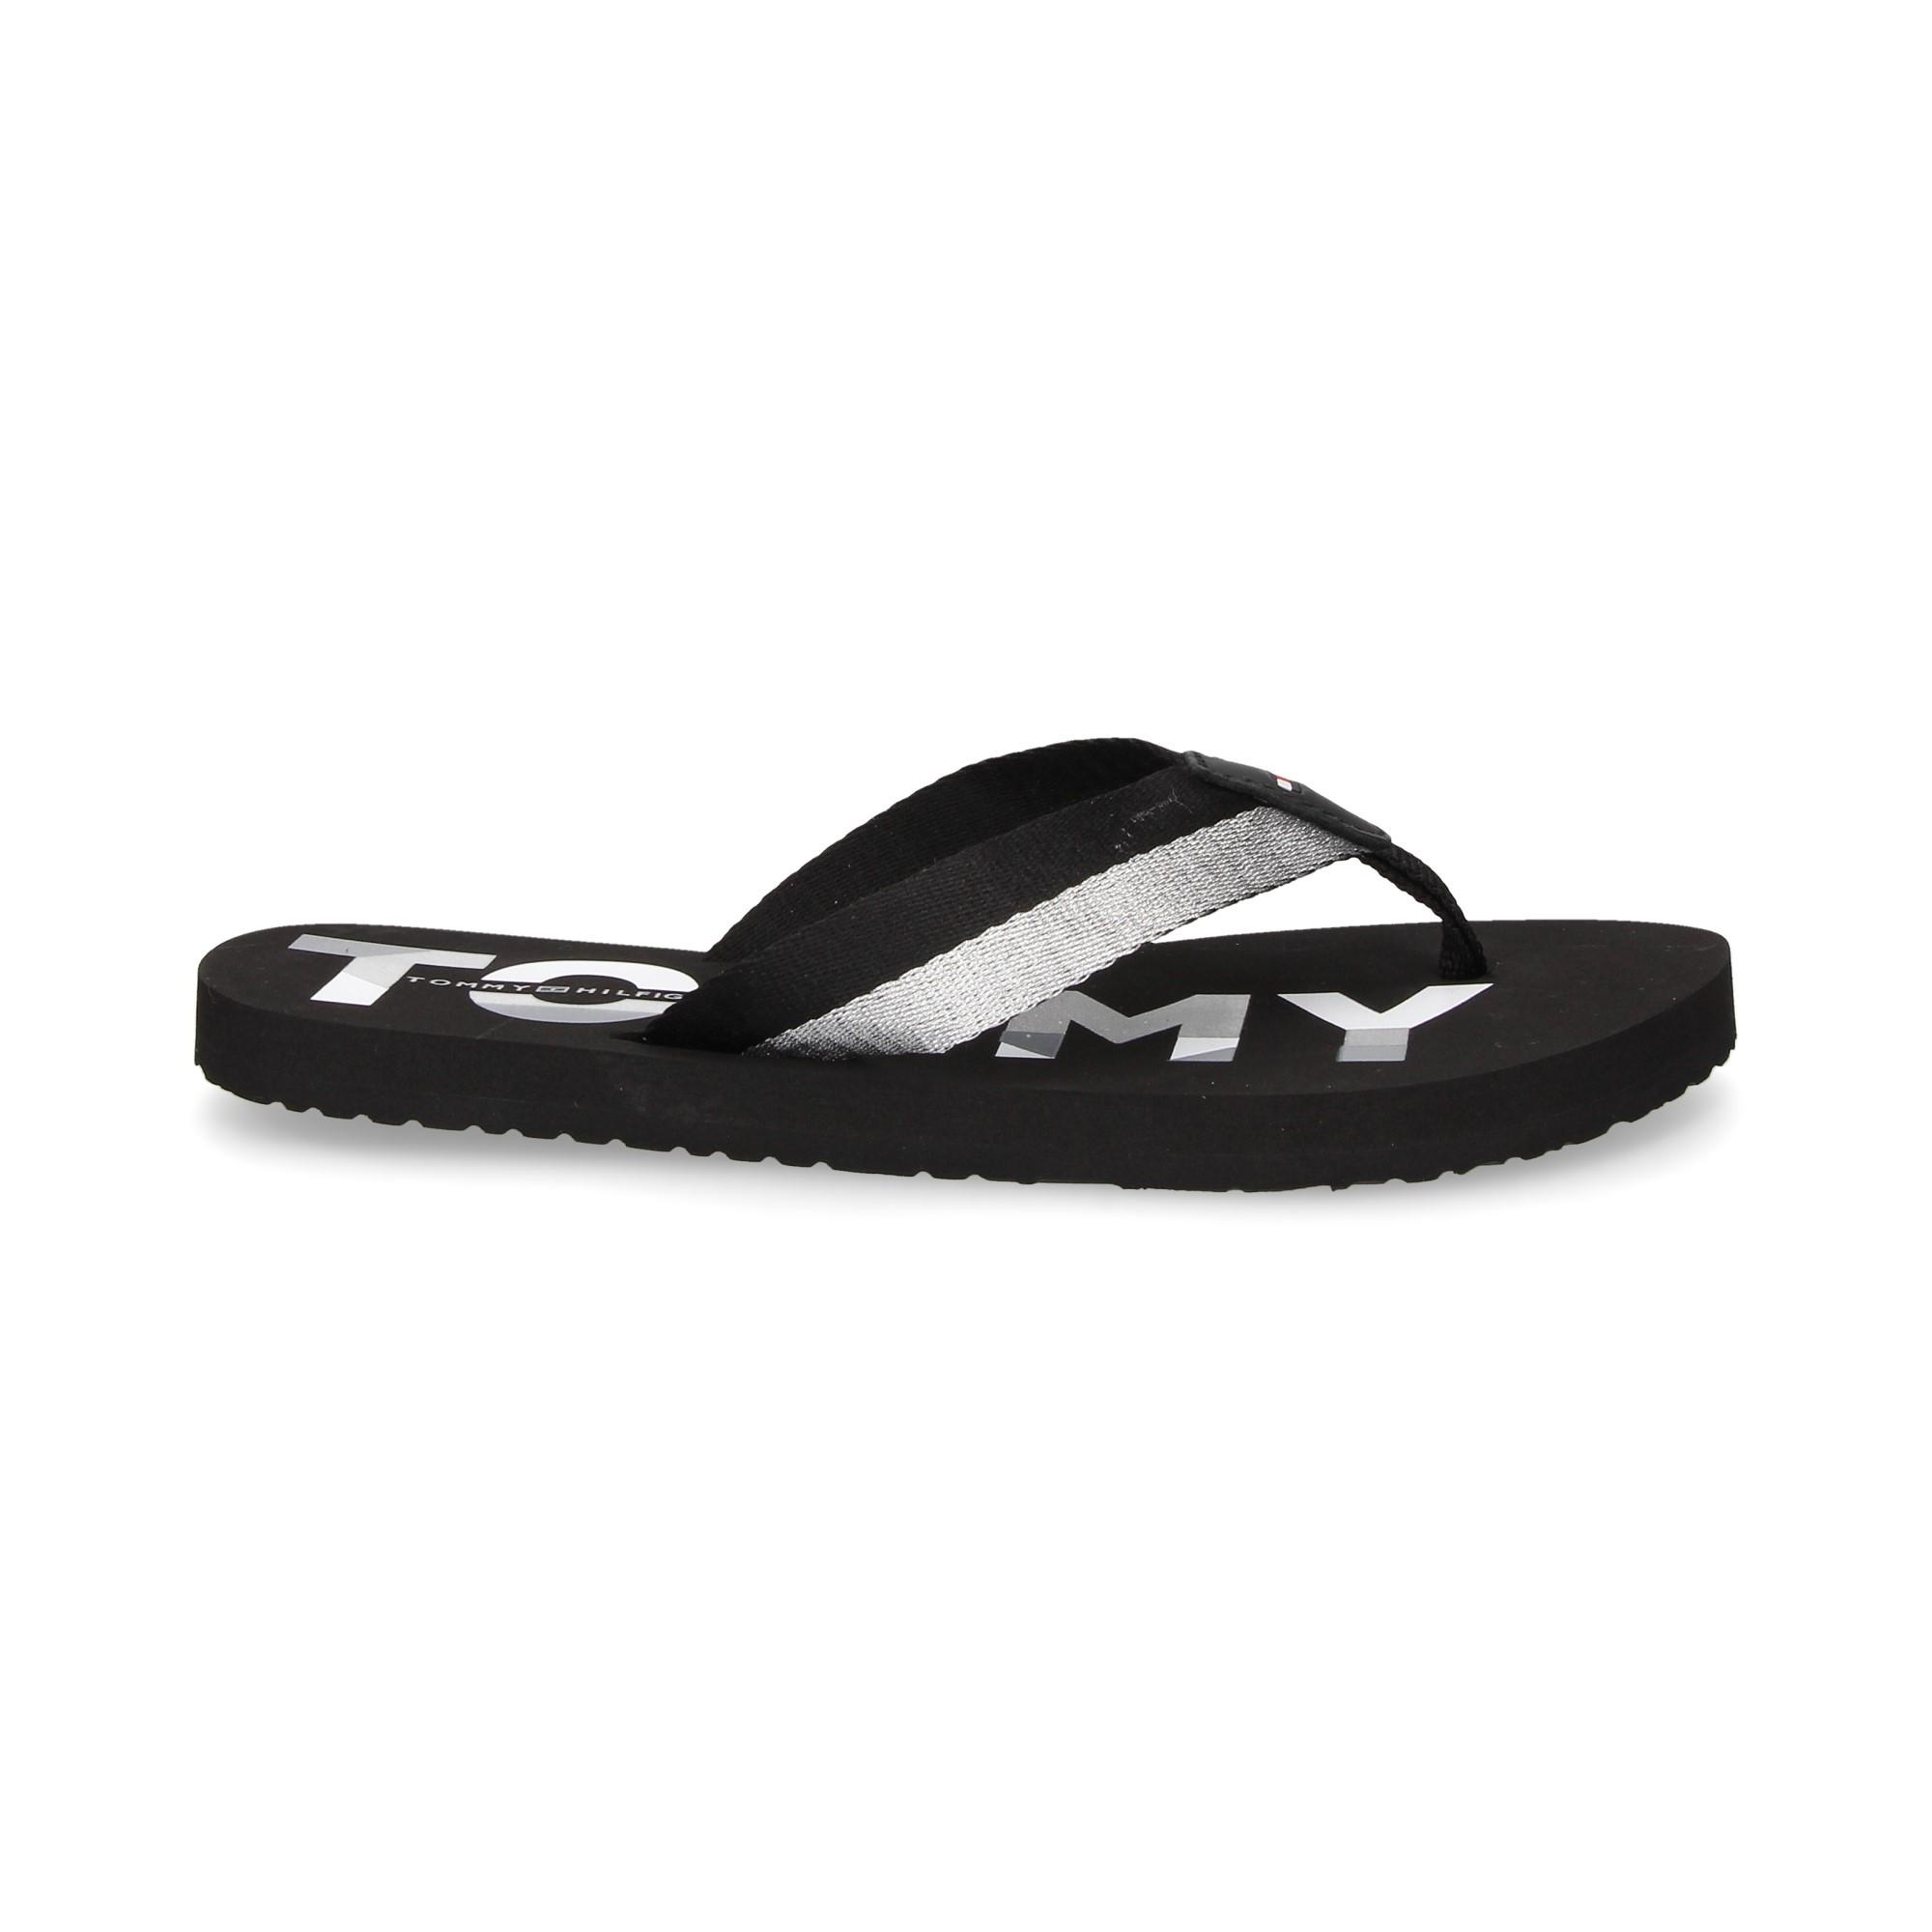 c5baf1a53 TOMMY HILFIGER Women s Flip Flops FW2957 990 BLACK